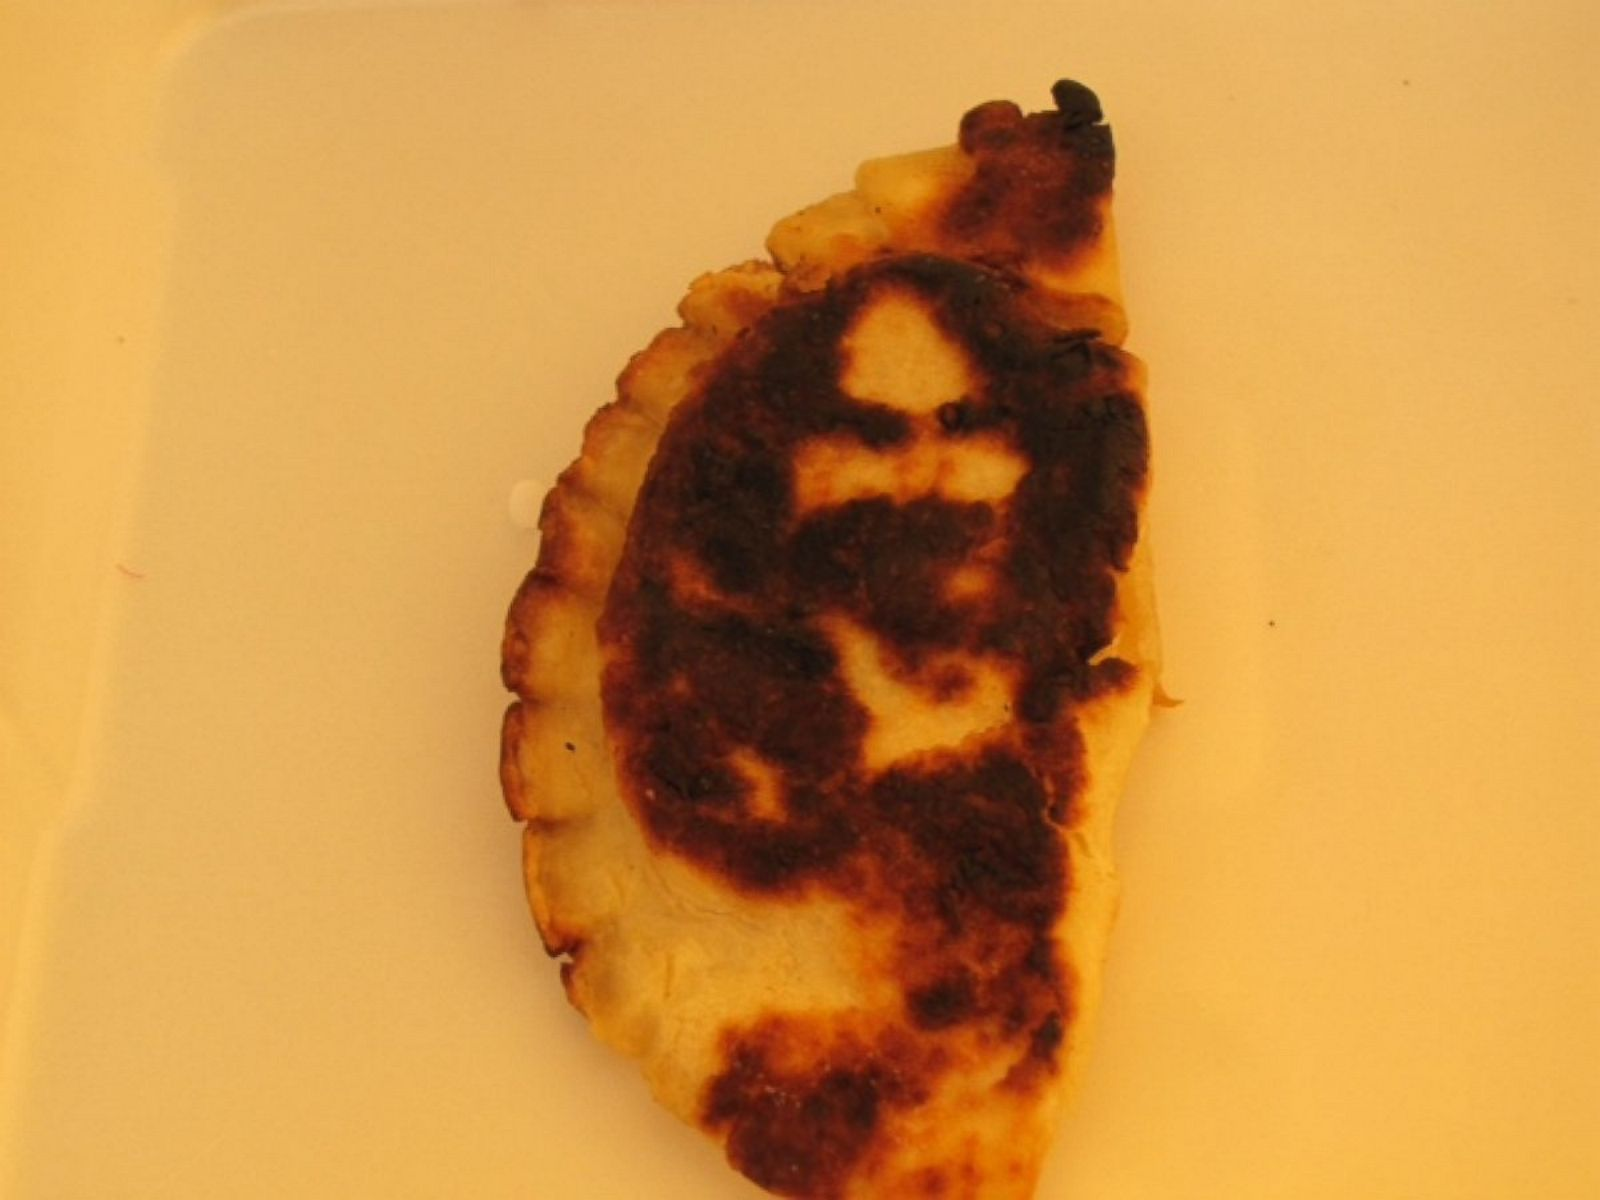 photos unusual sightings of holy figures photos abc news